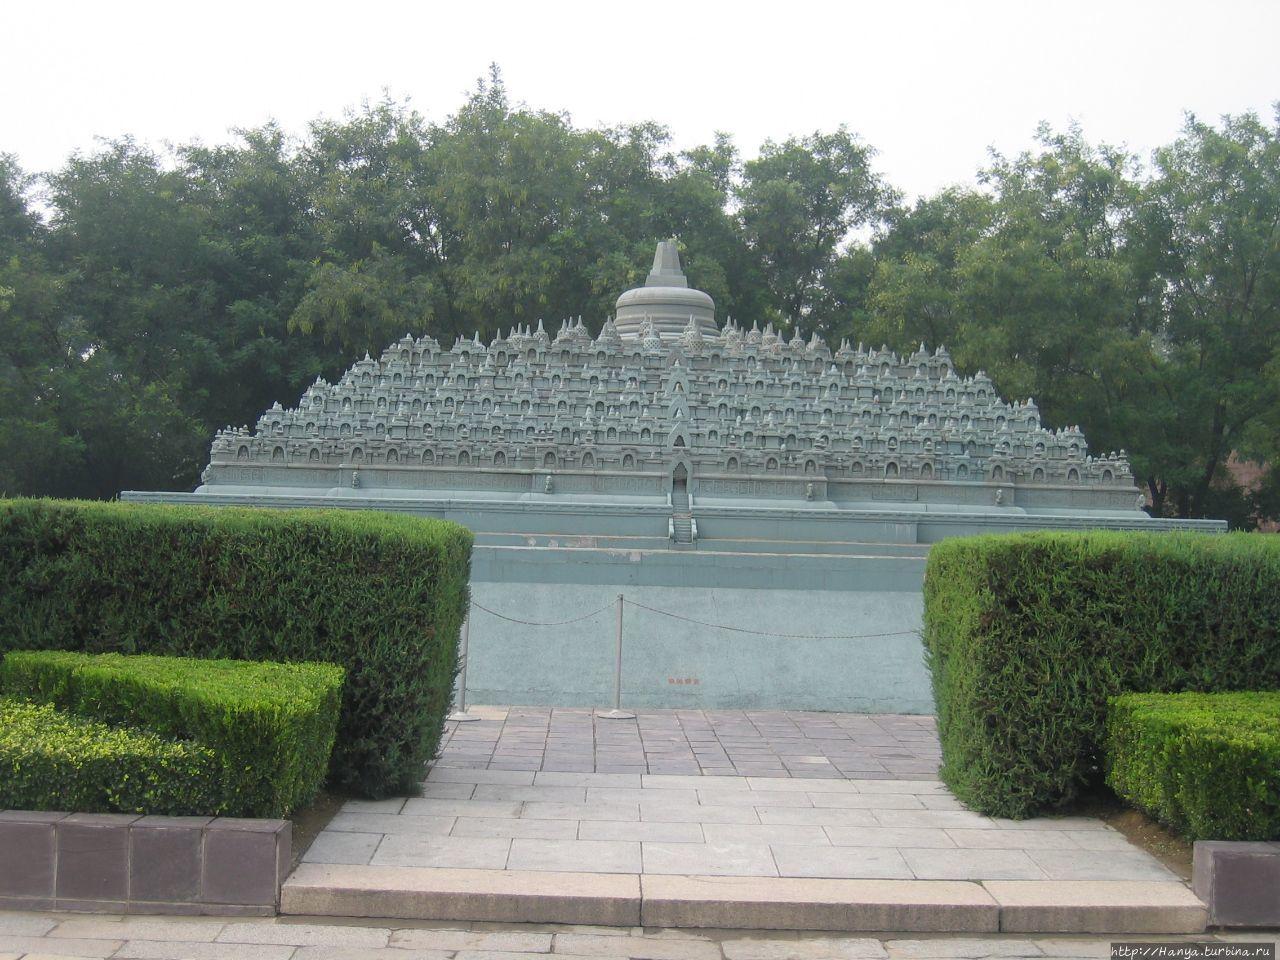 Пекин. Парк Миниатюр.Индо